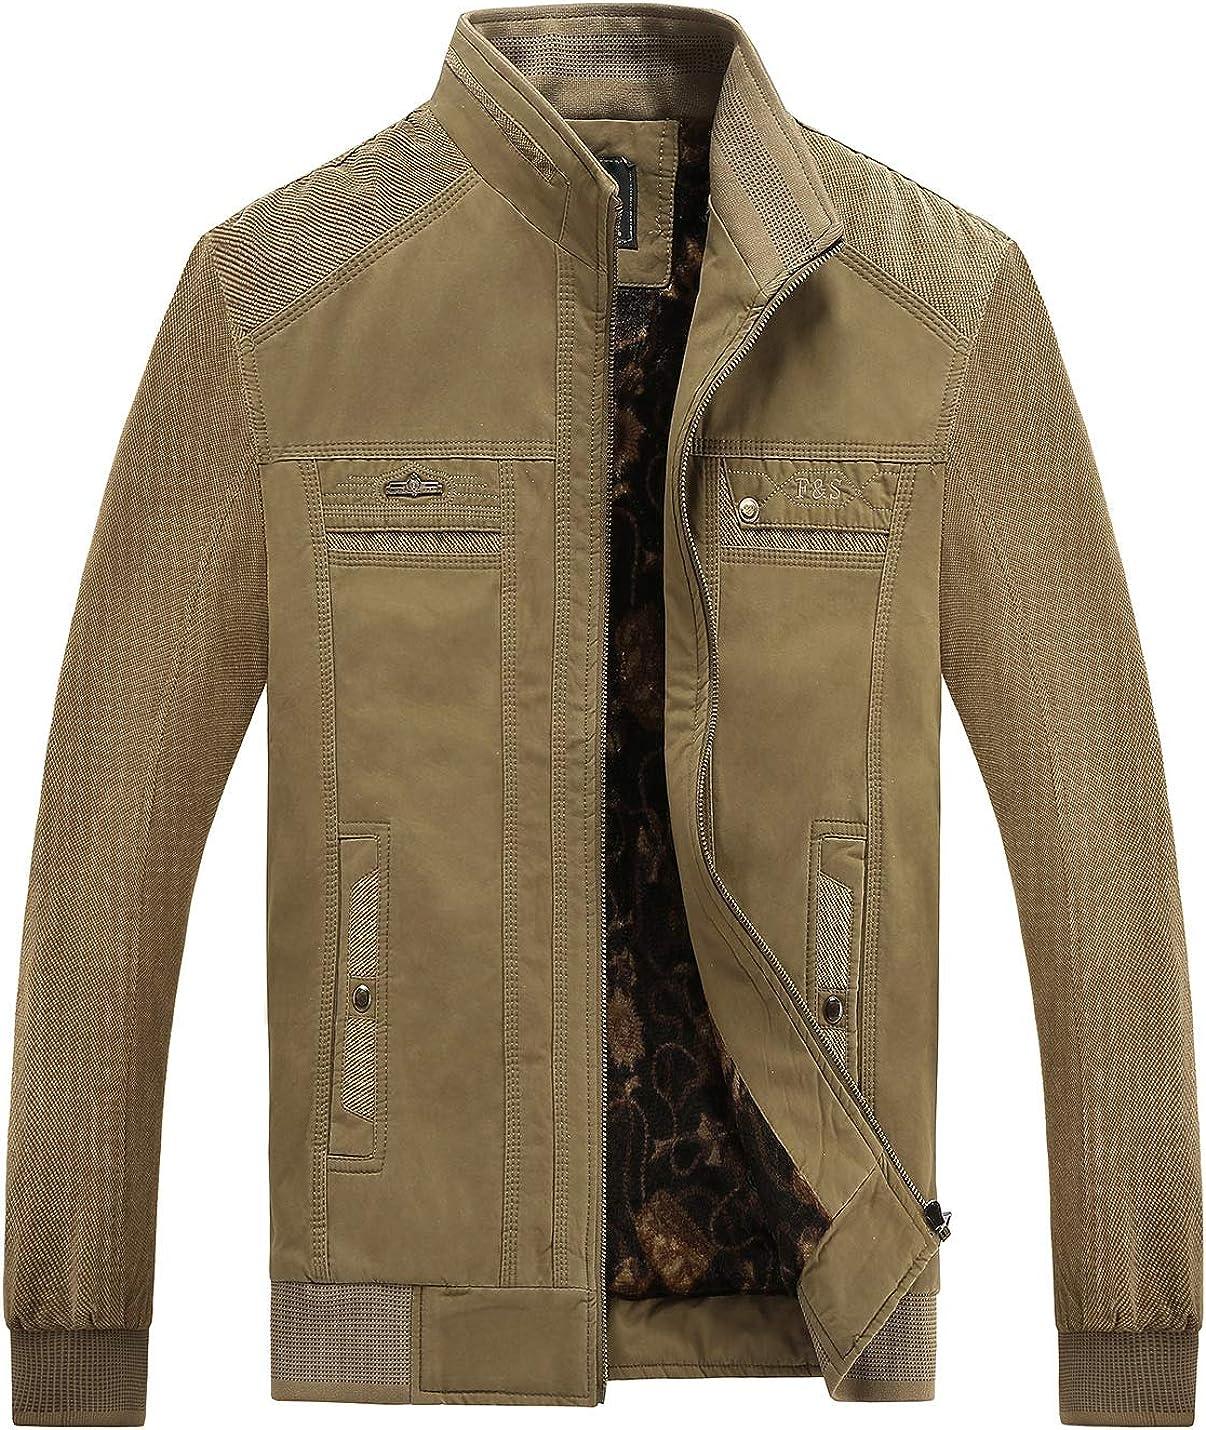 Gihuo Men's Durable Cotton Stand Collar Fleece Lined Jacket